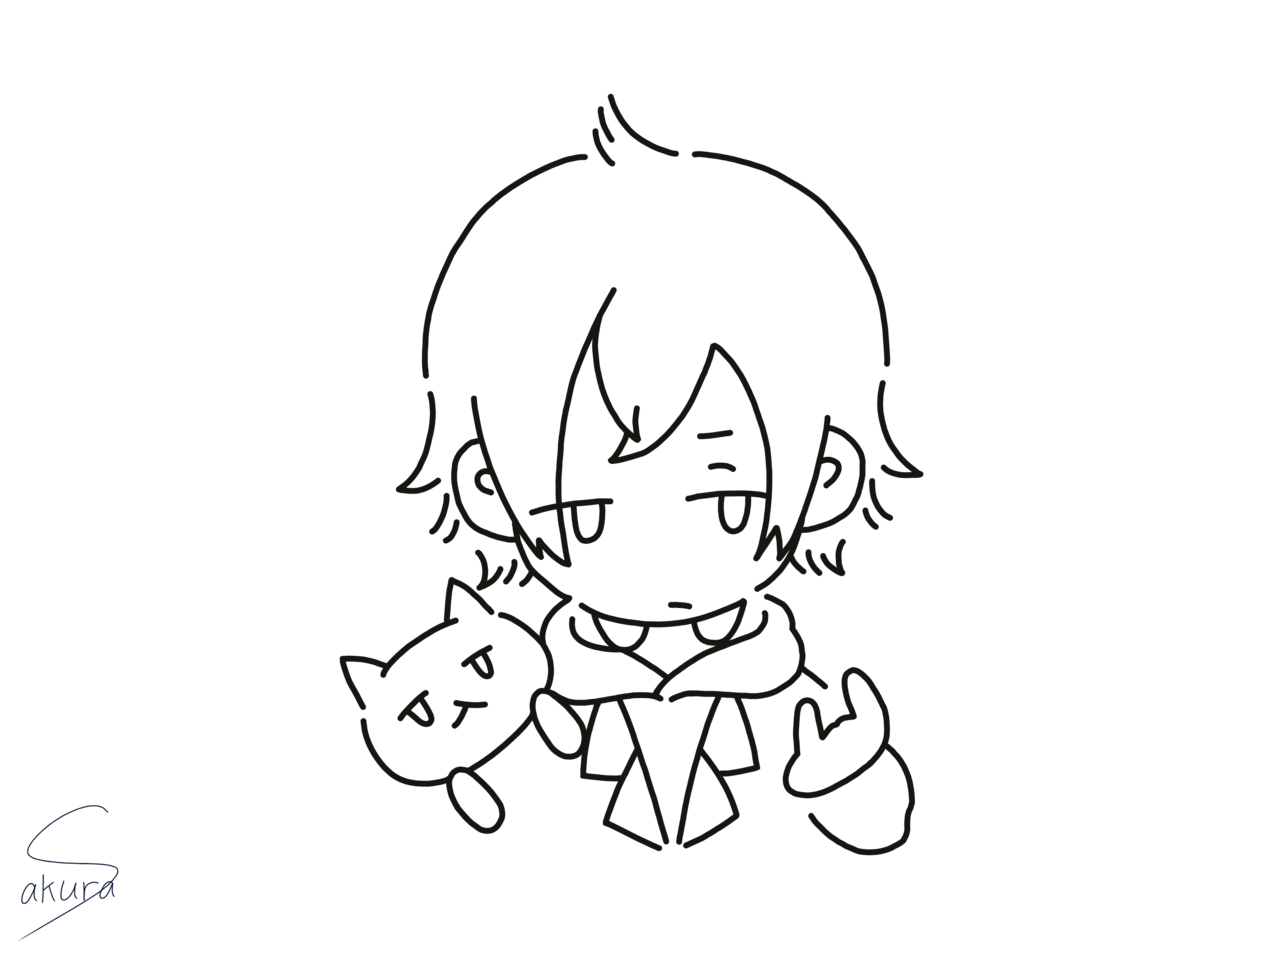 Gero Illust of 桜 宮美/サブ Gero line_art 桜宮美